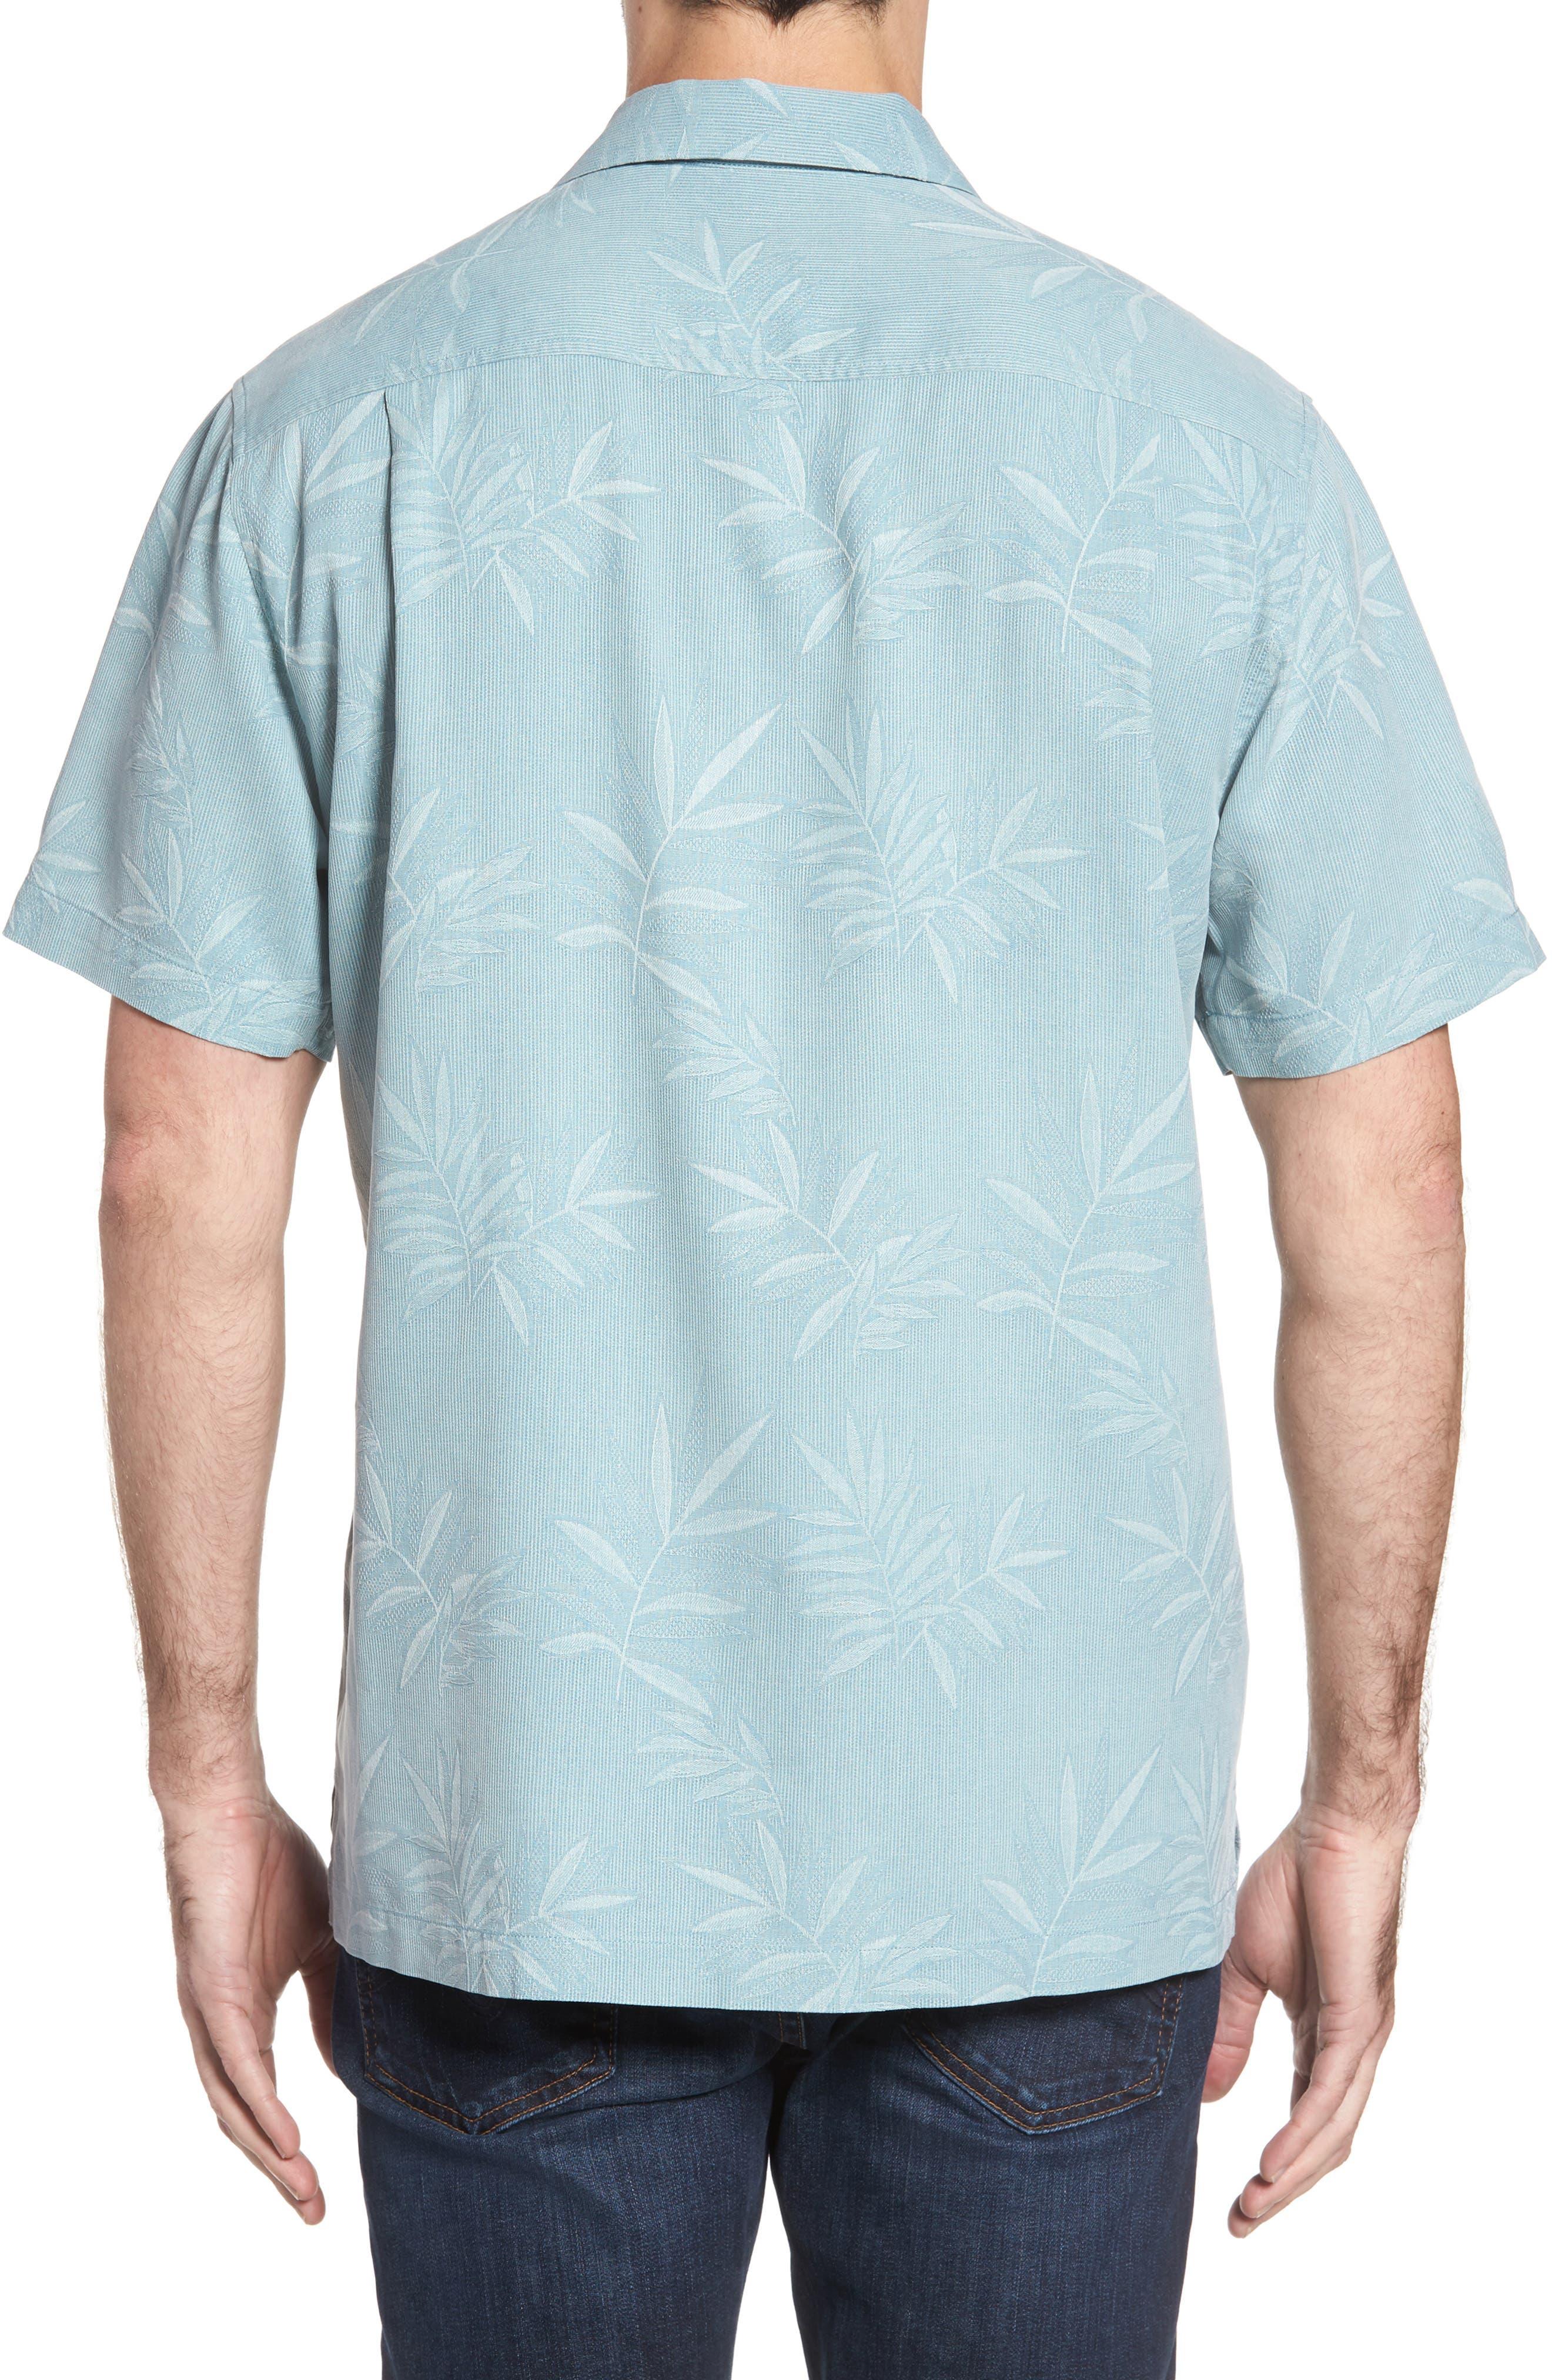 Luau Floral Silk Shirt,                             Alternate thumbnail 2, color,                             301